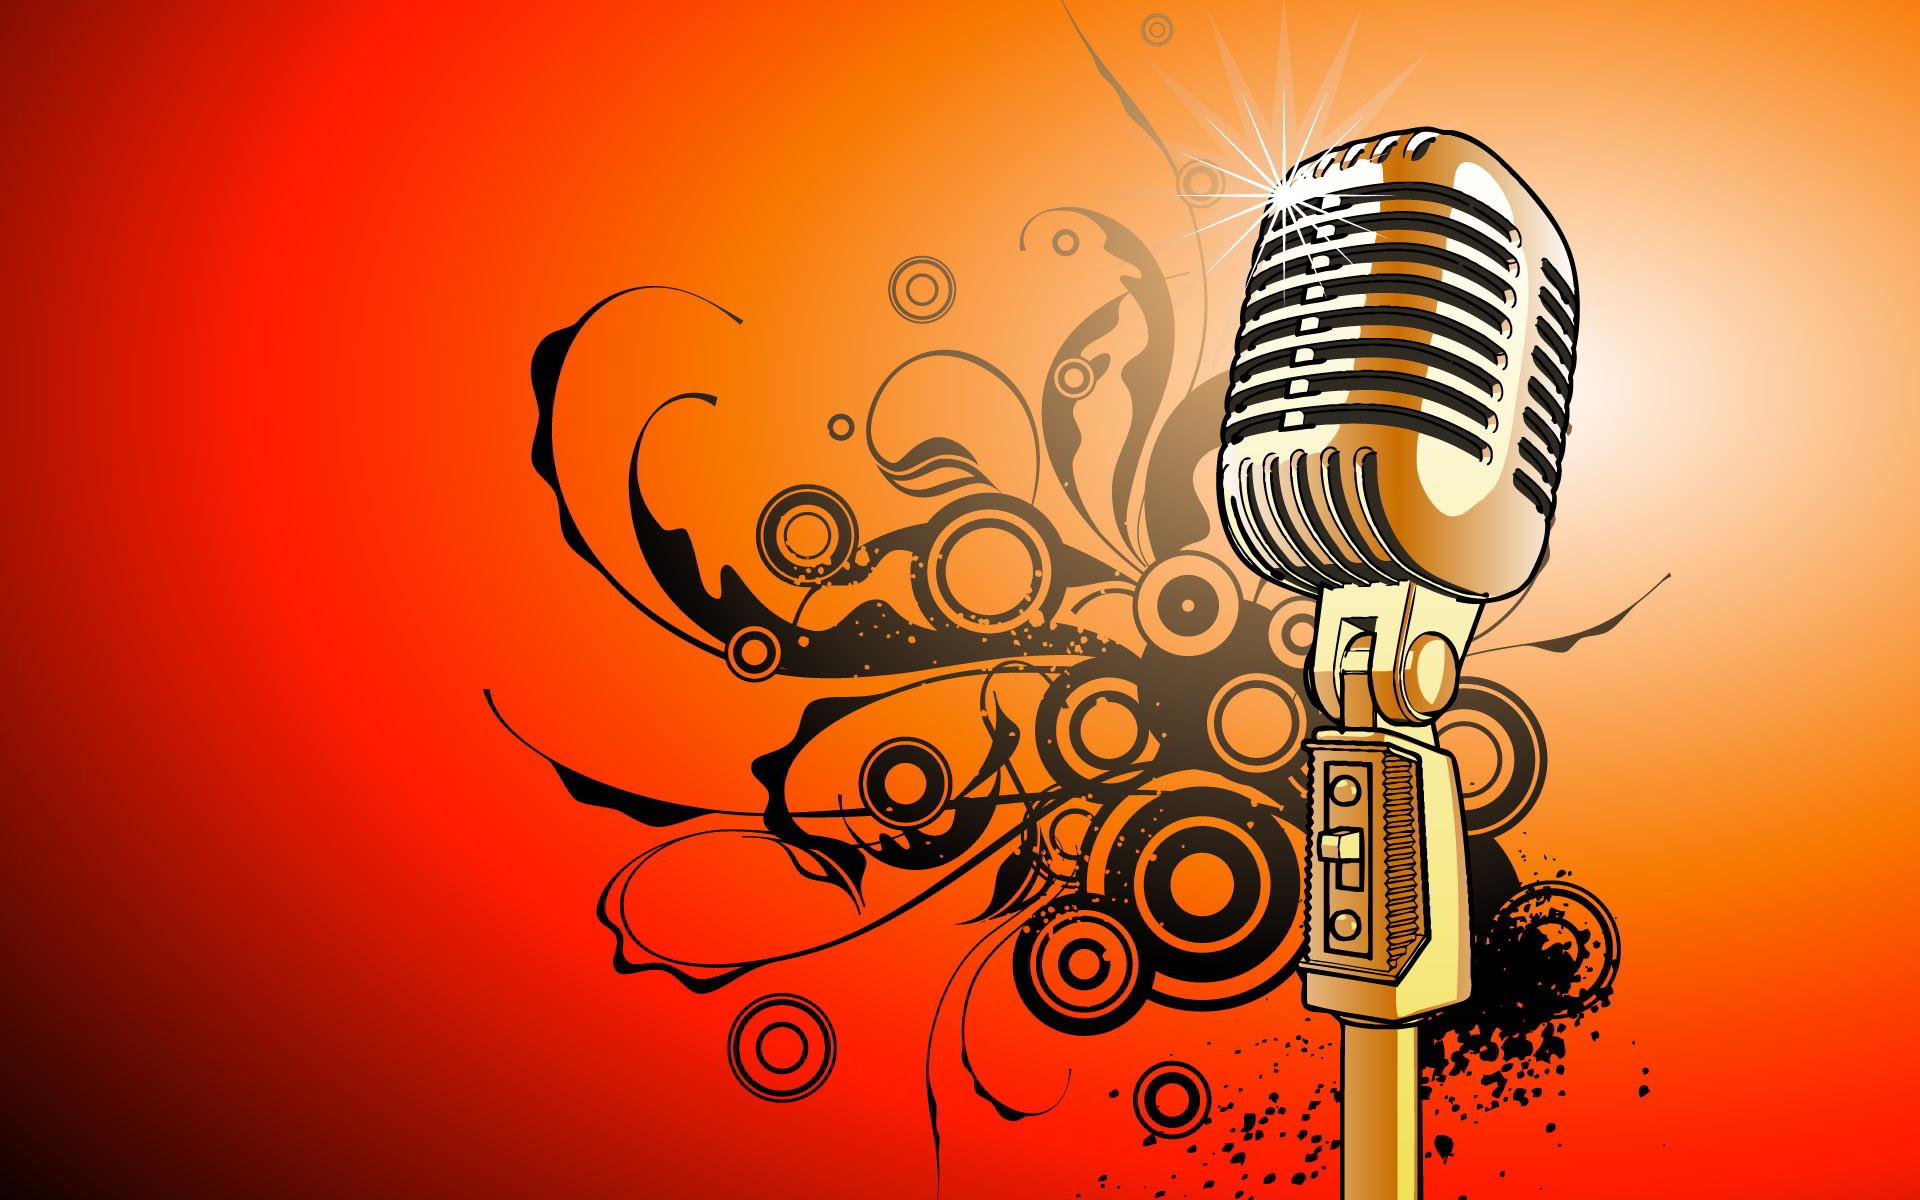 Microphone vector art Wallpapers | Pictures